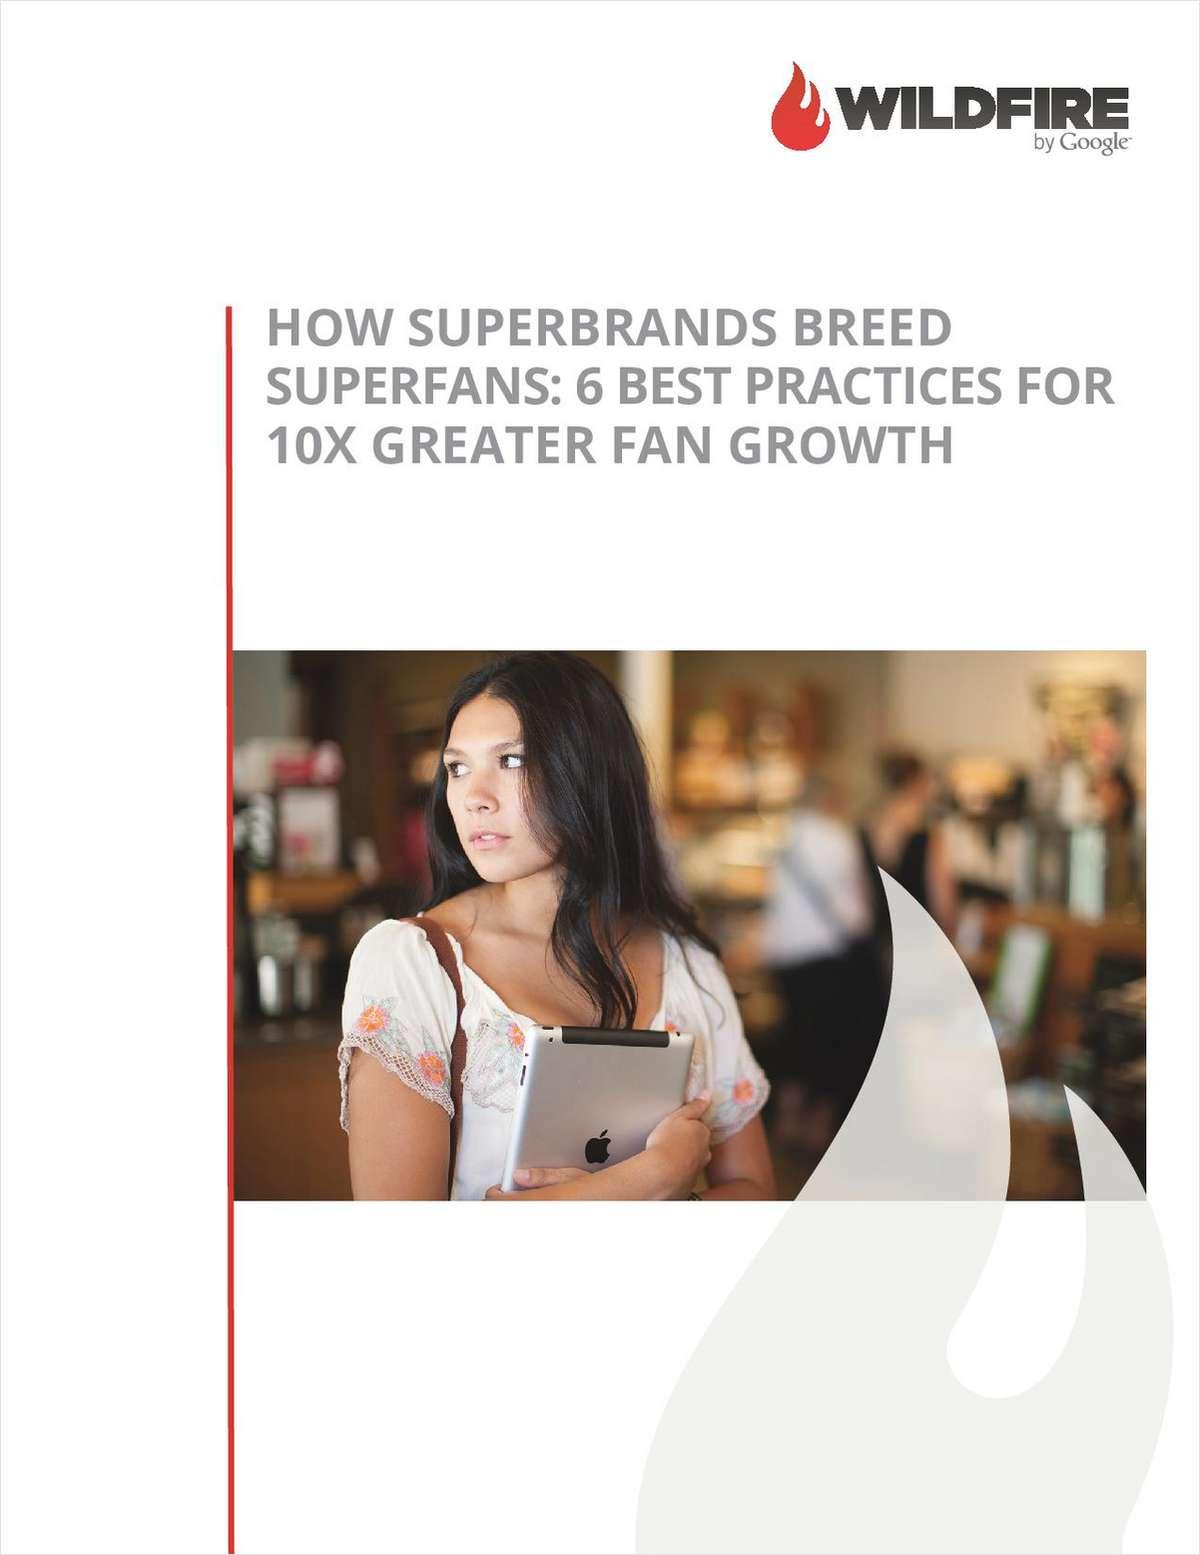 How Superbrands Breed Superfans